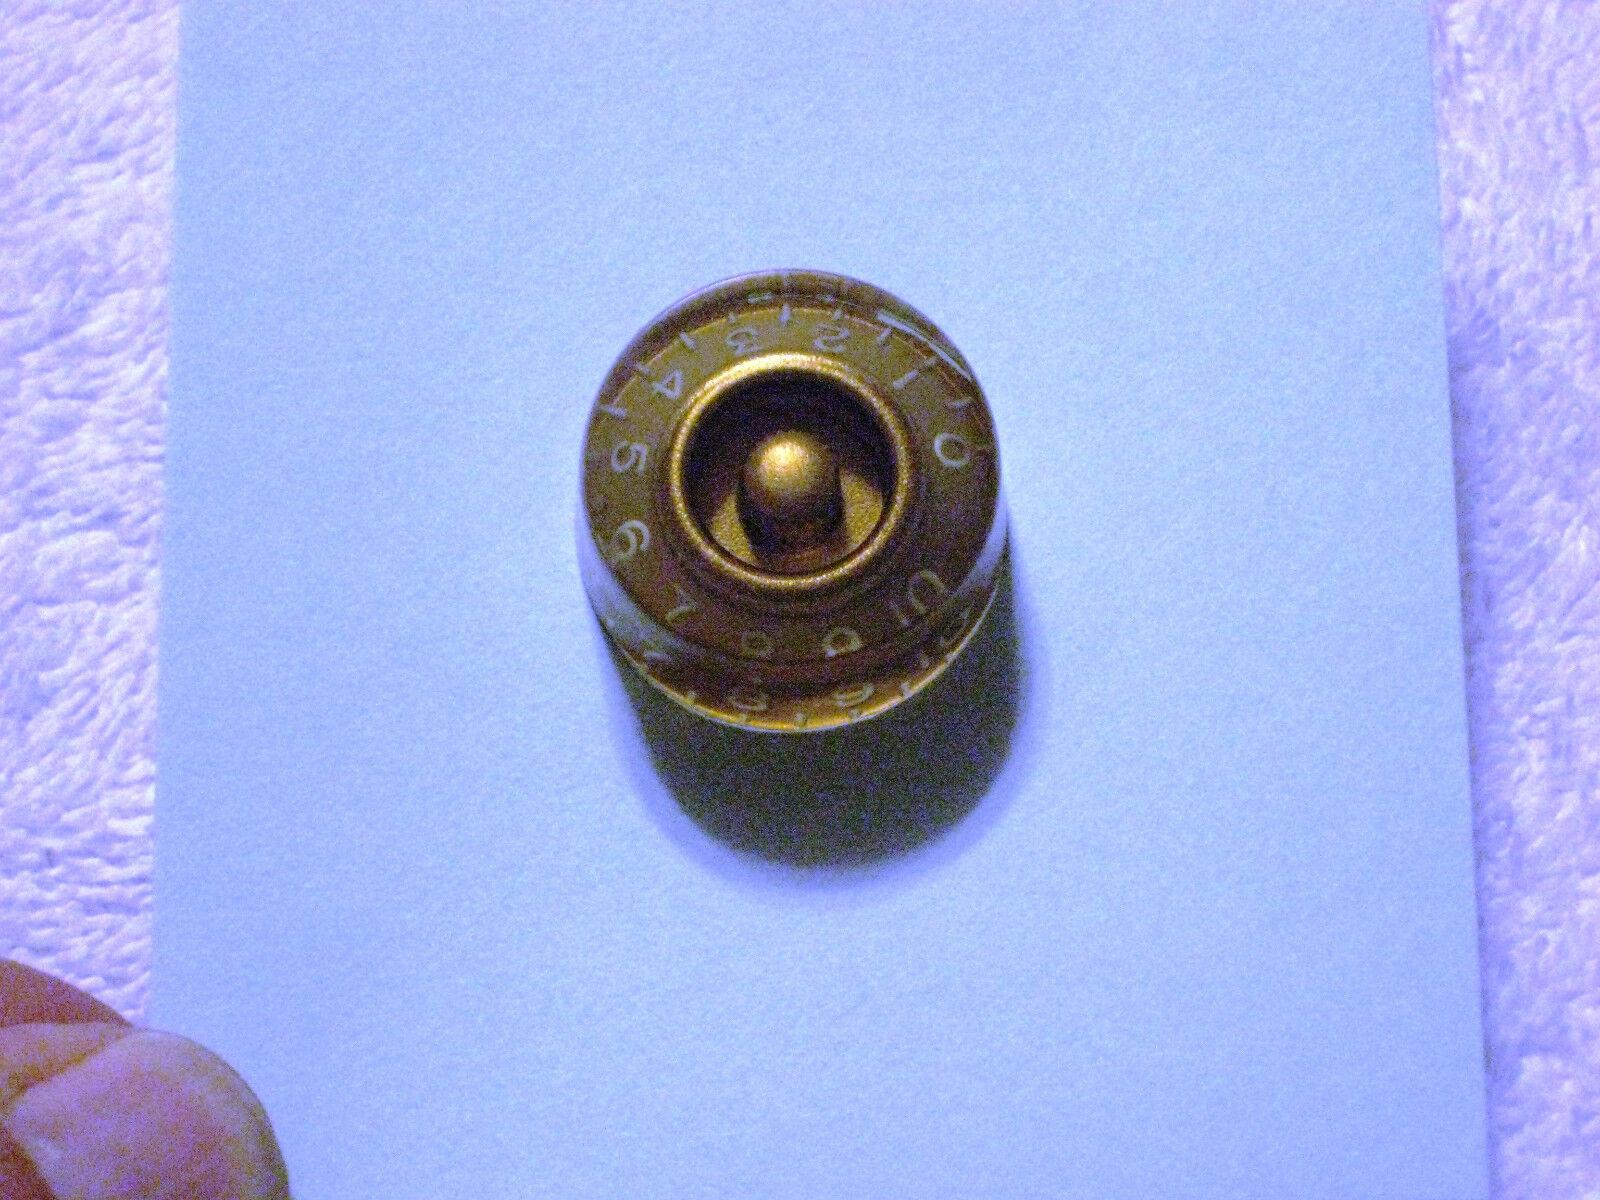 NOS 1960'S-1970's GIBSON Gold SPEED NOB KALAMAZOO FAKTORY 3 OF 3